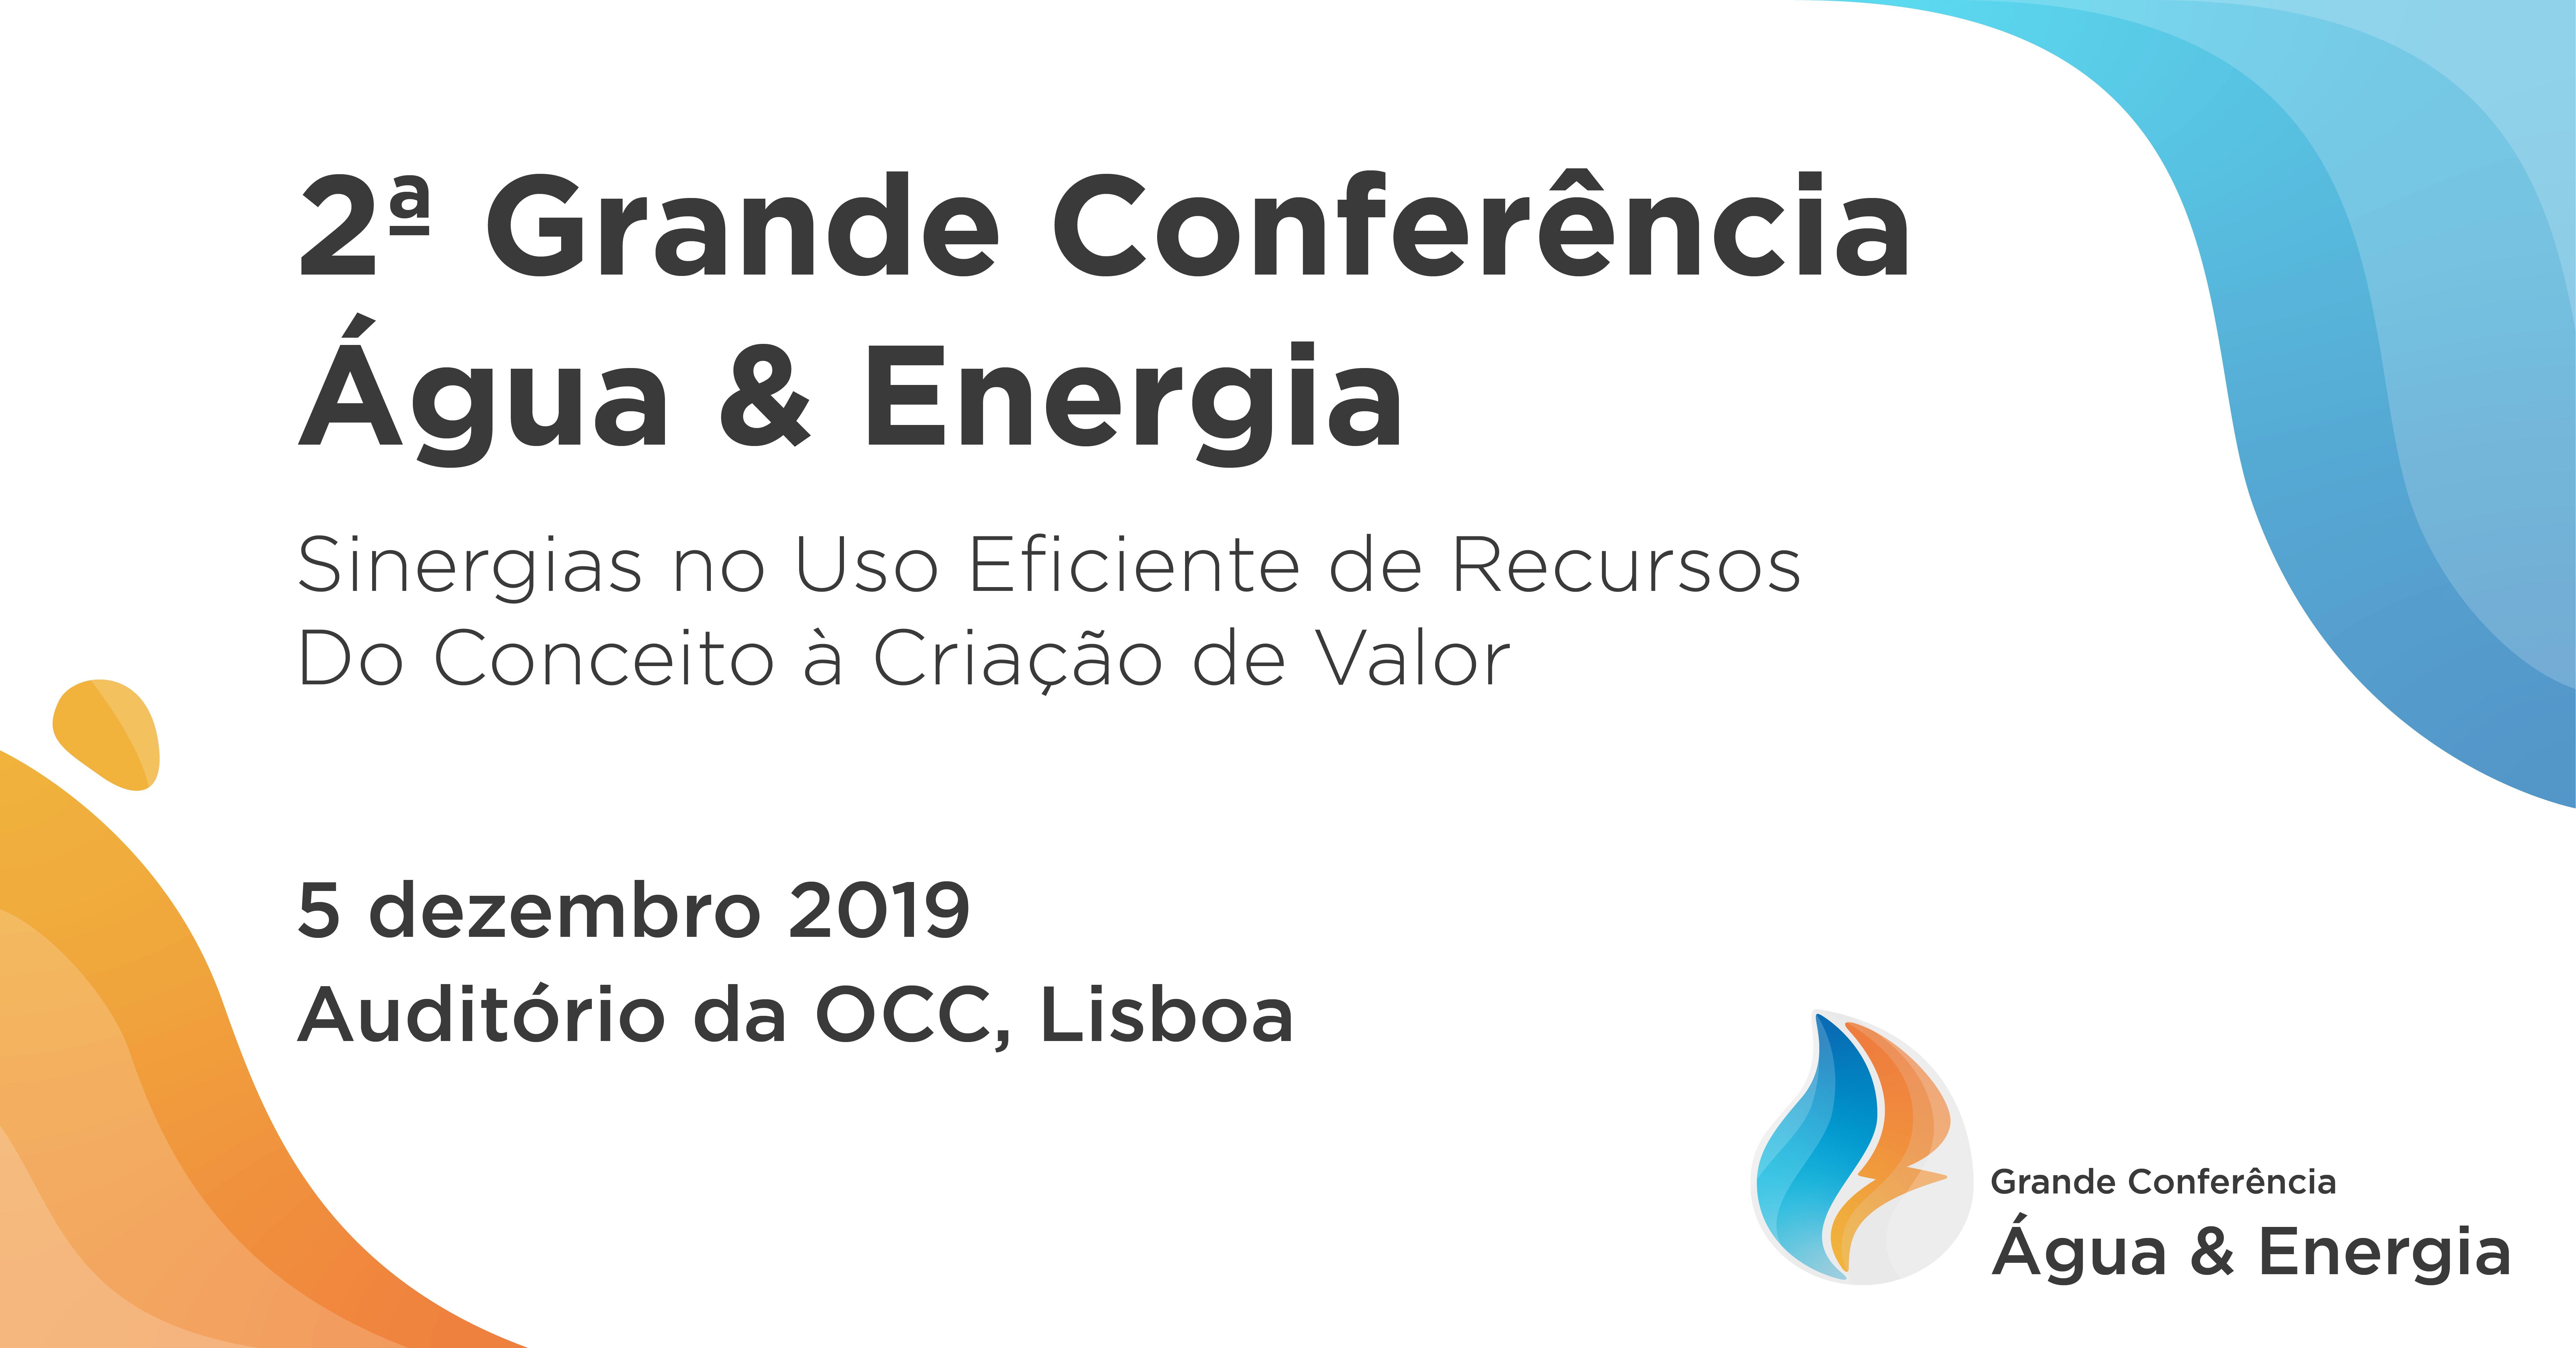 2ª Grande Conferência Água & Energia